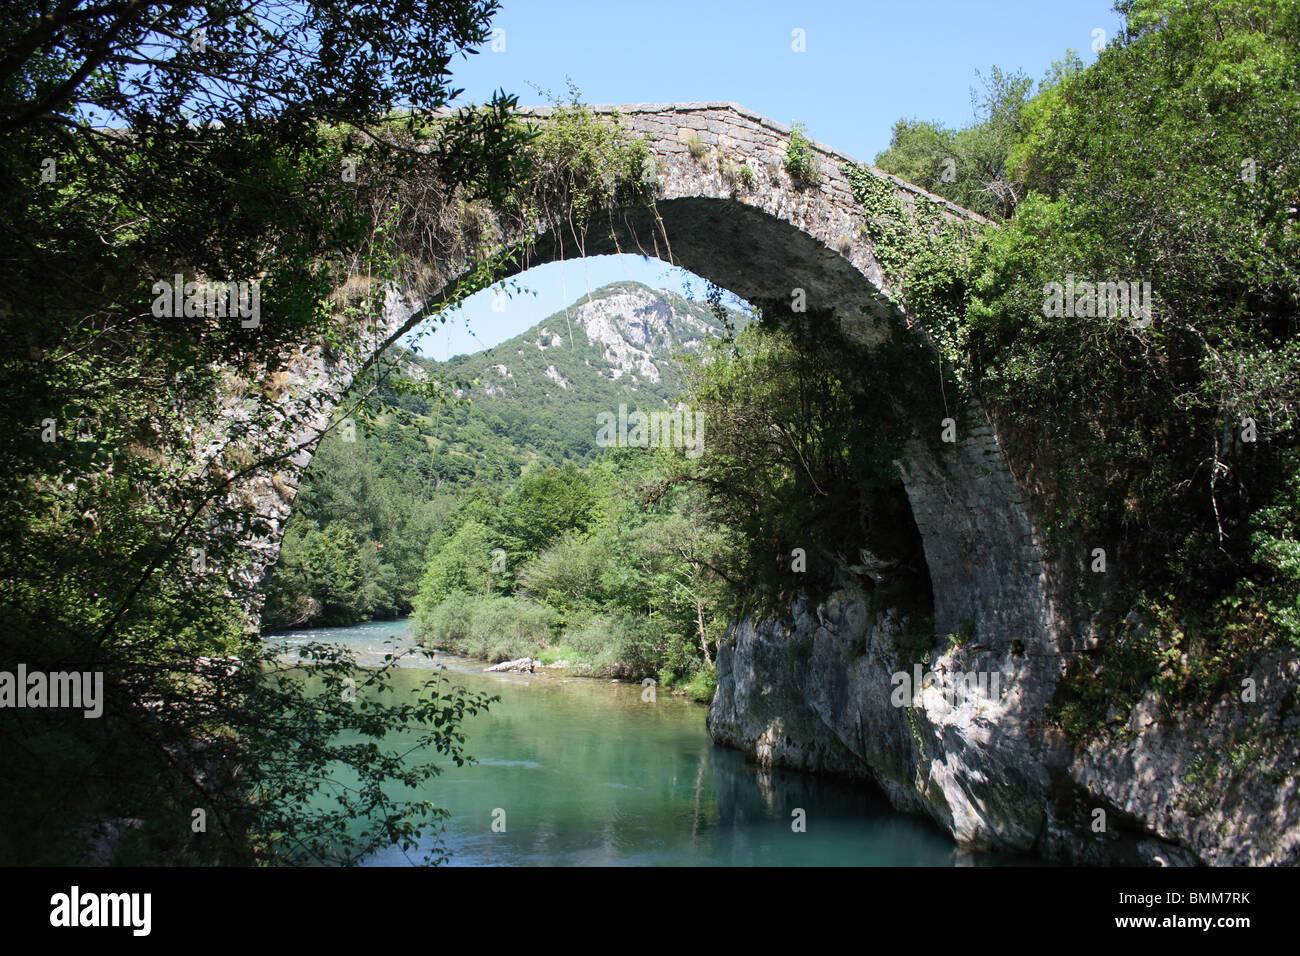 Puenta de Vidre Roman Bridge over the Rio Cares, Picos de Europa, Asturias, Spain. - Stock Image